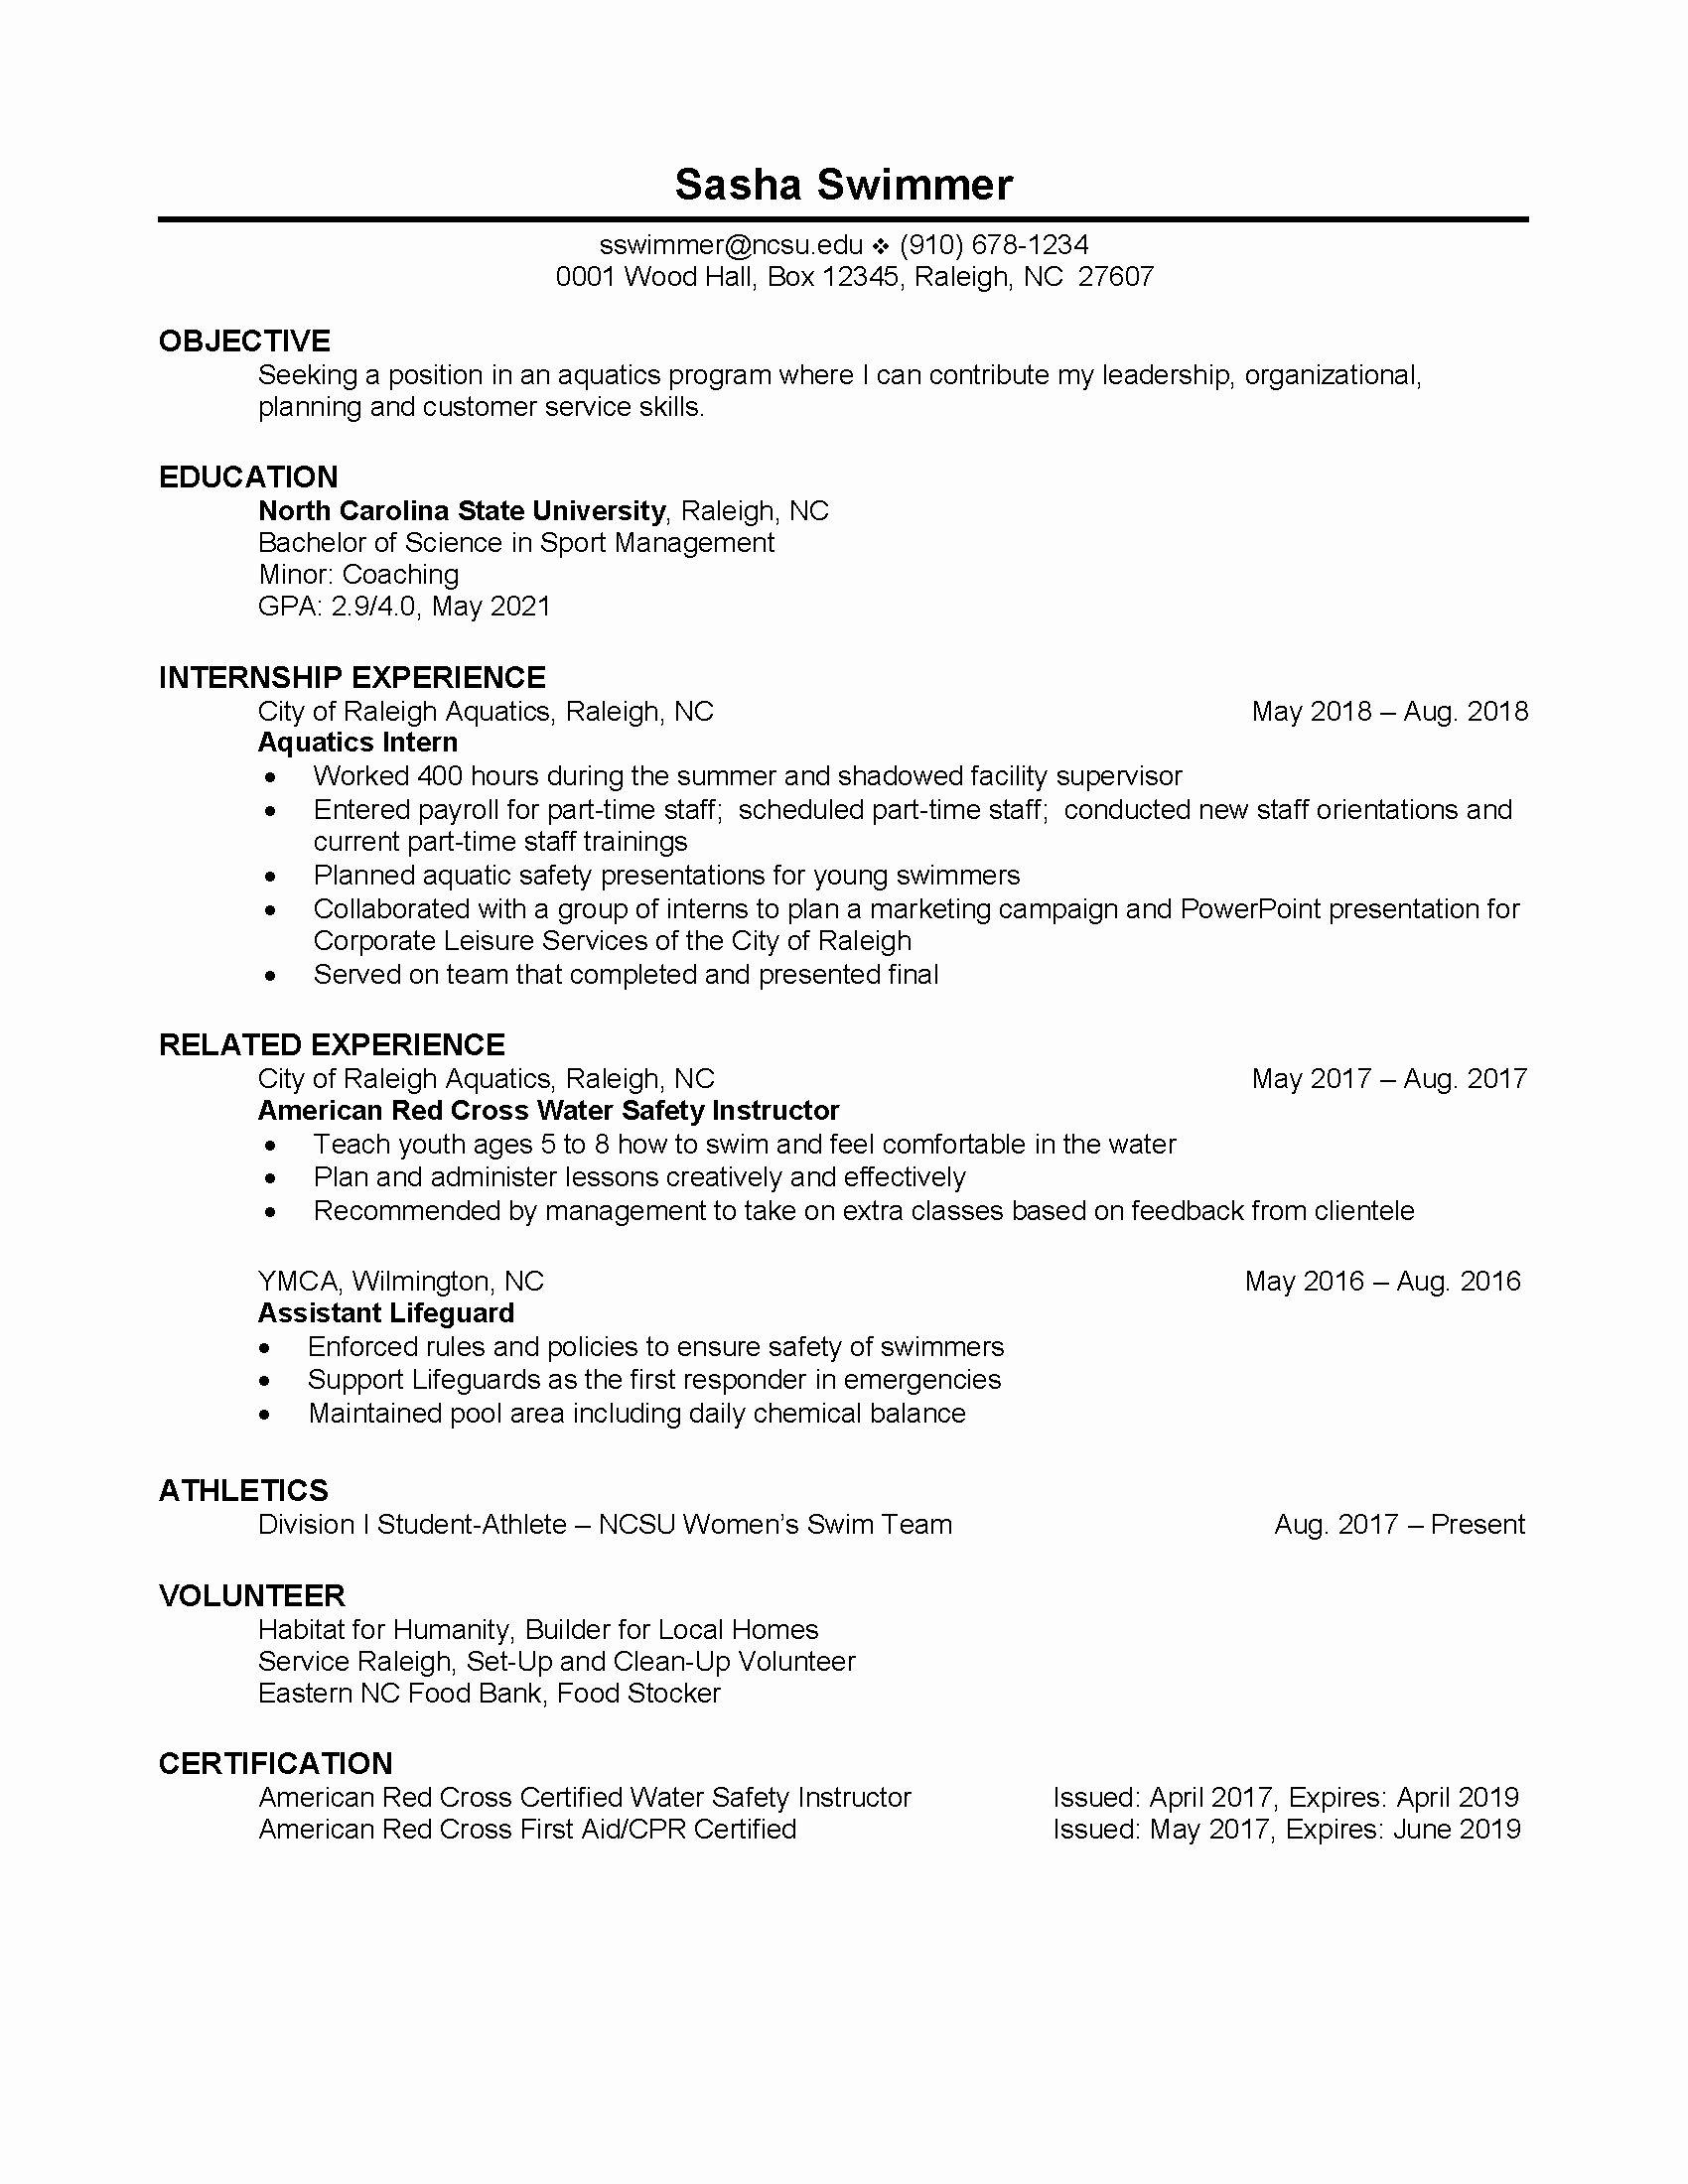 23 student athlete resume example in 2020 resume